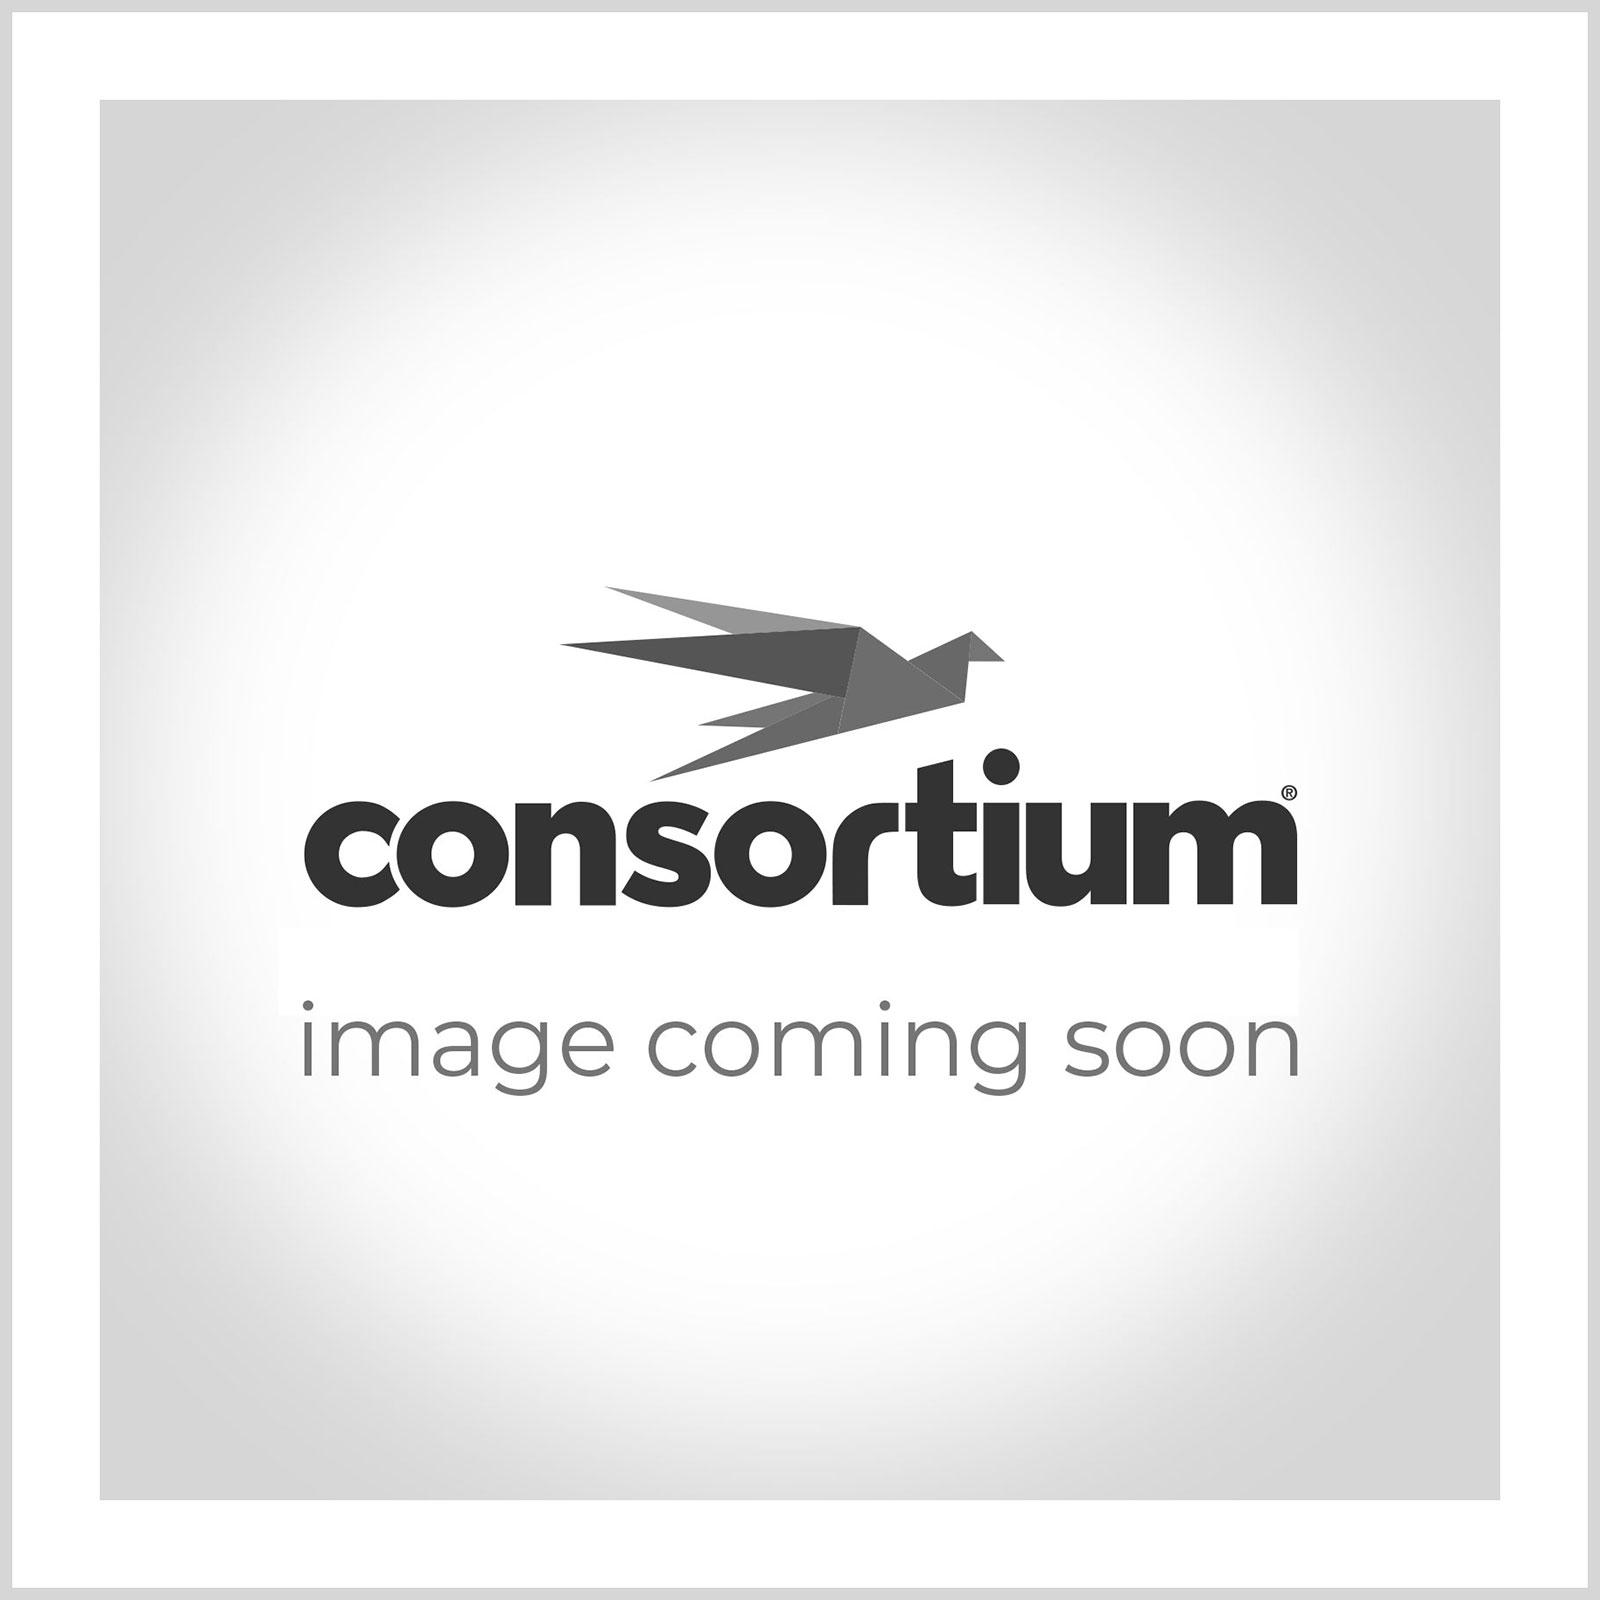 Consortium Extra Soft 2 Ply Facial Tissues